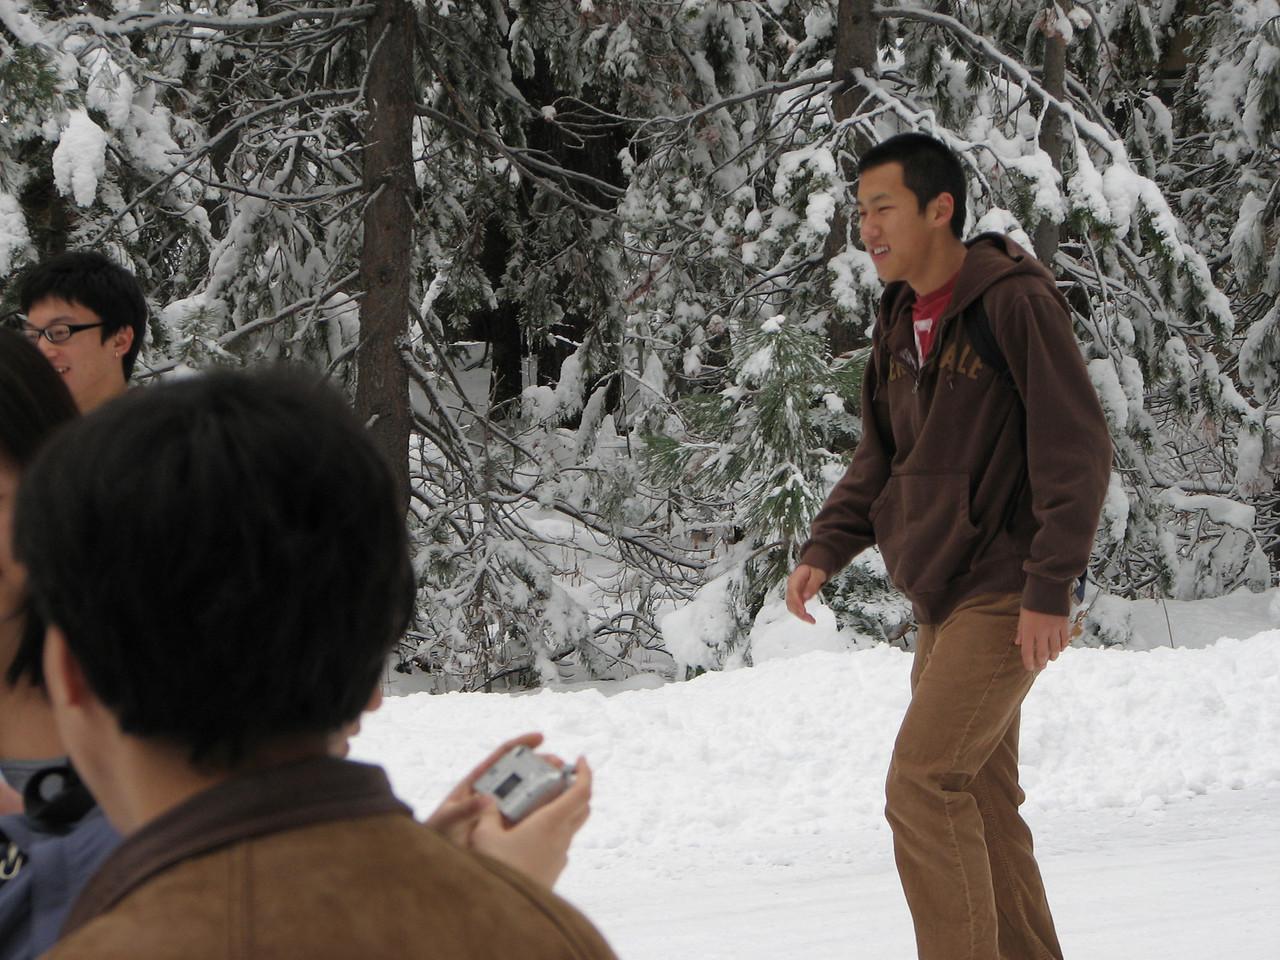 2006 12 23 Sat - Jimmy Lee & Doug Kang